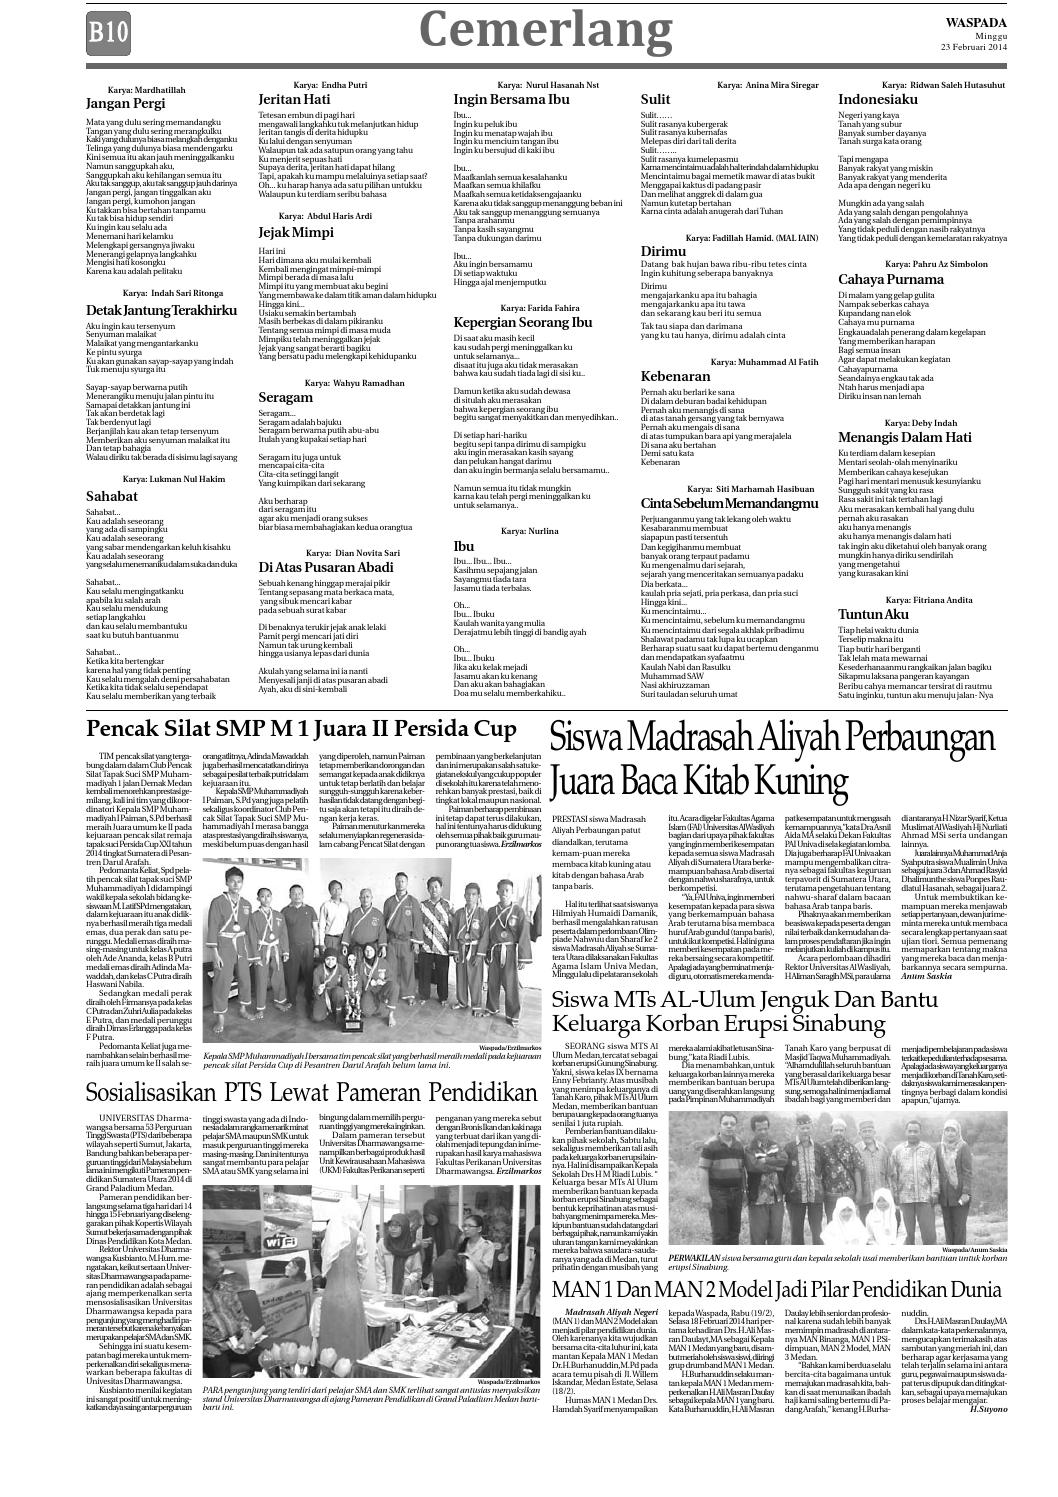 Waspada Minggu 23 Februari 2014 By Harian Waspada Issuu